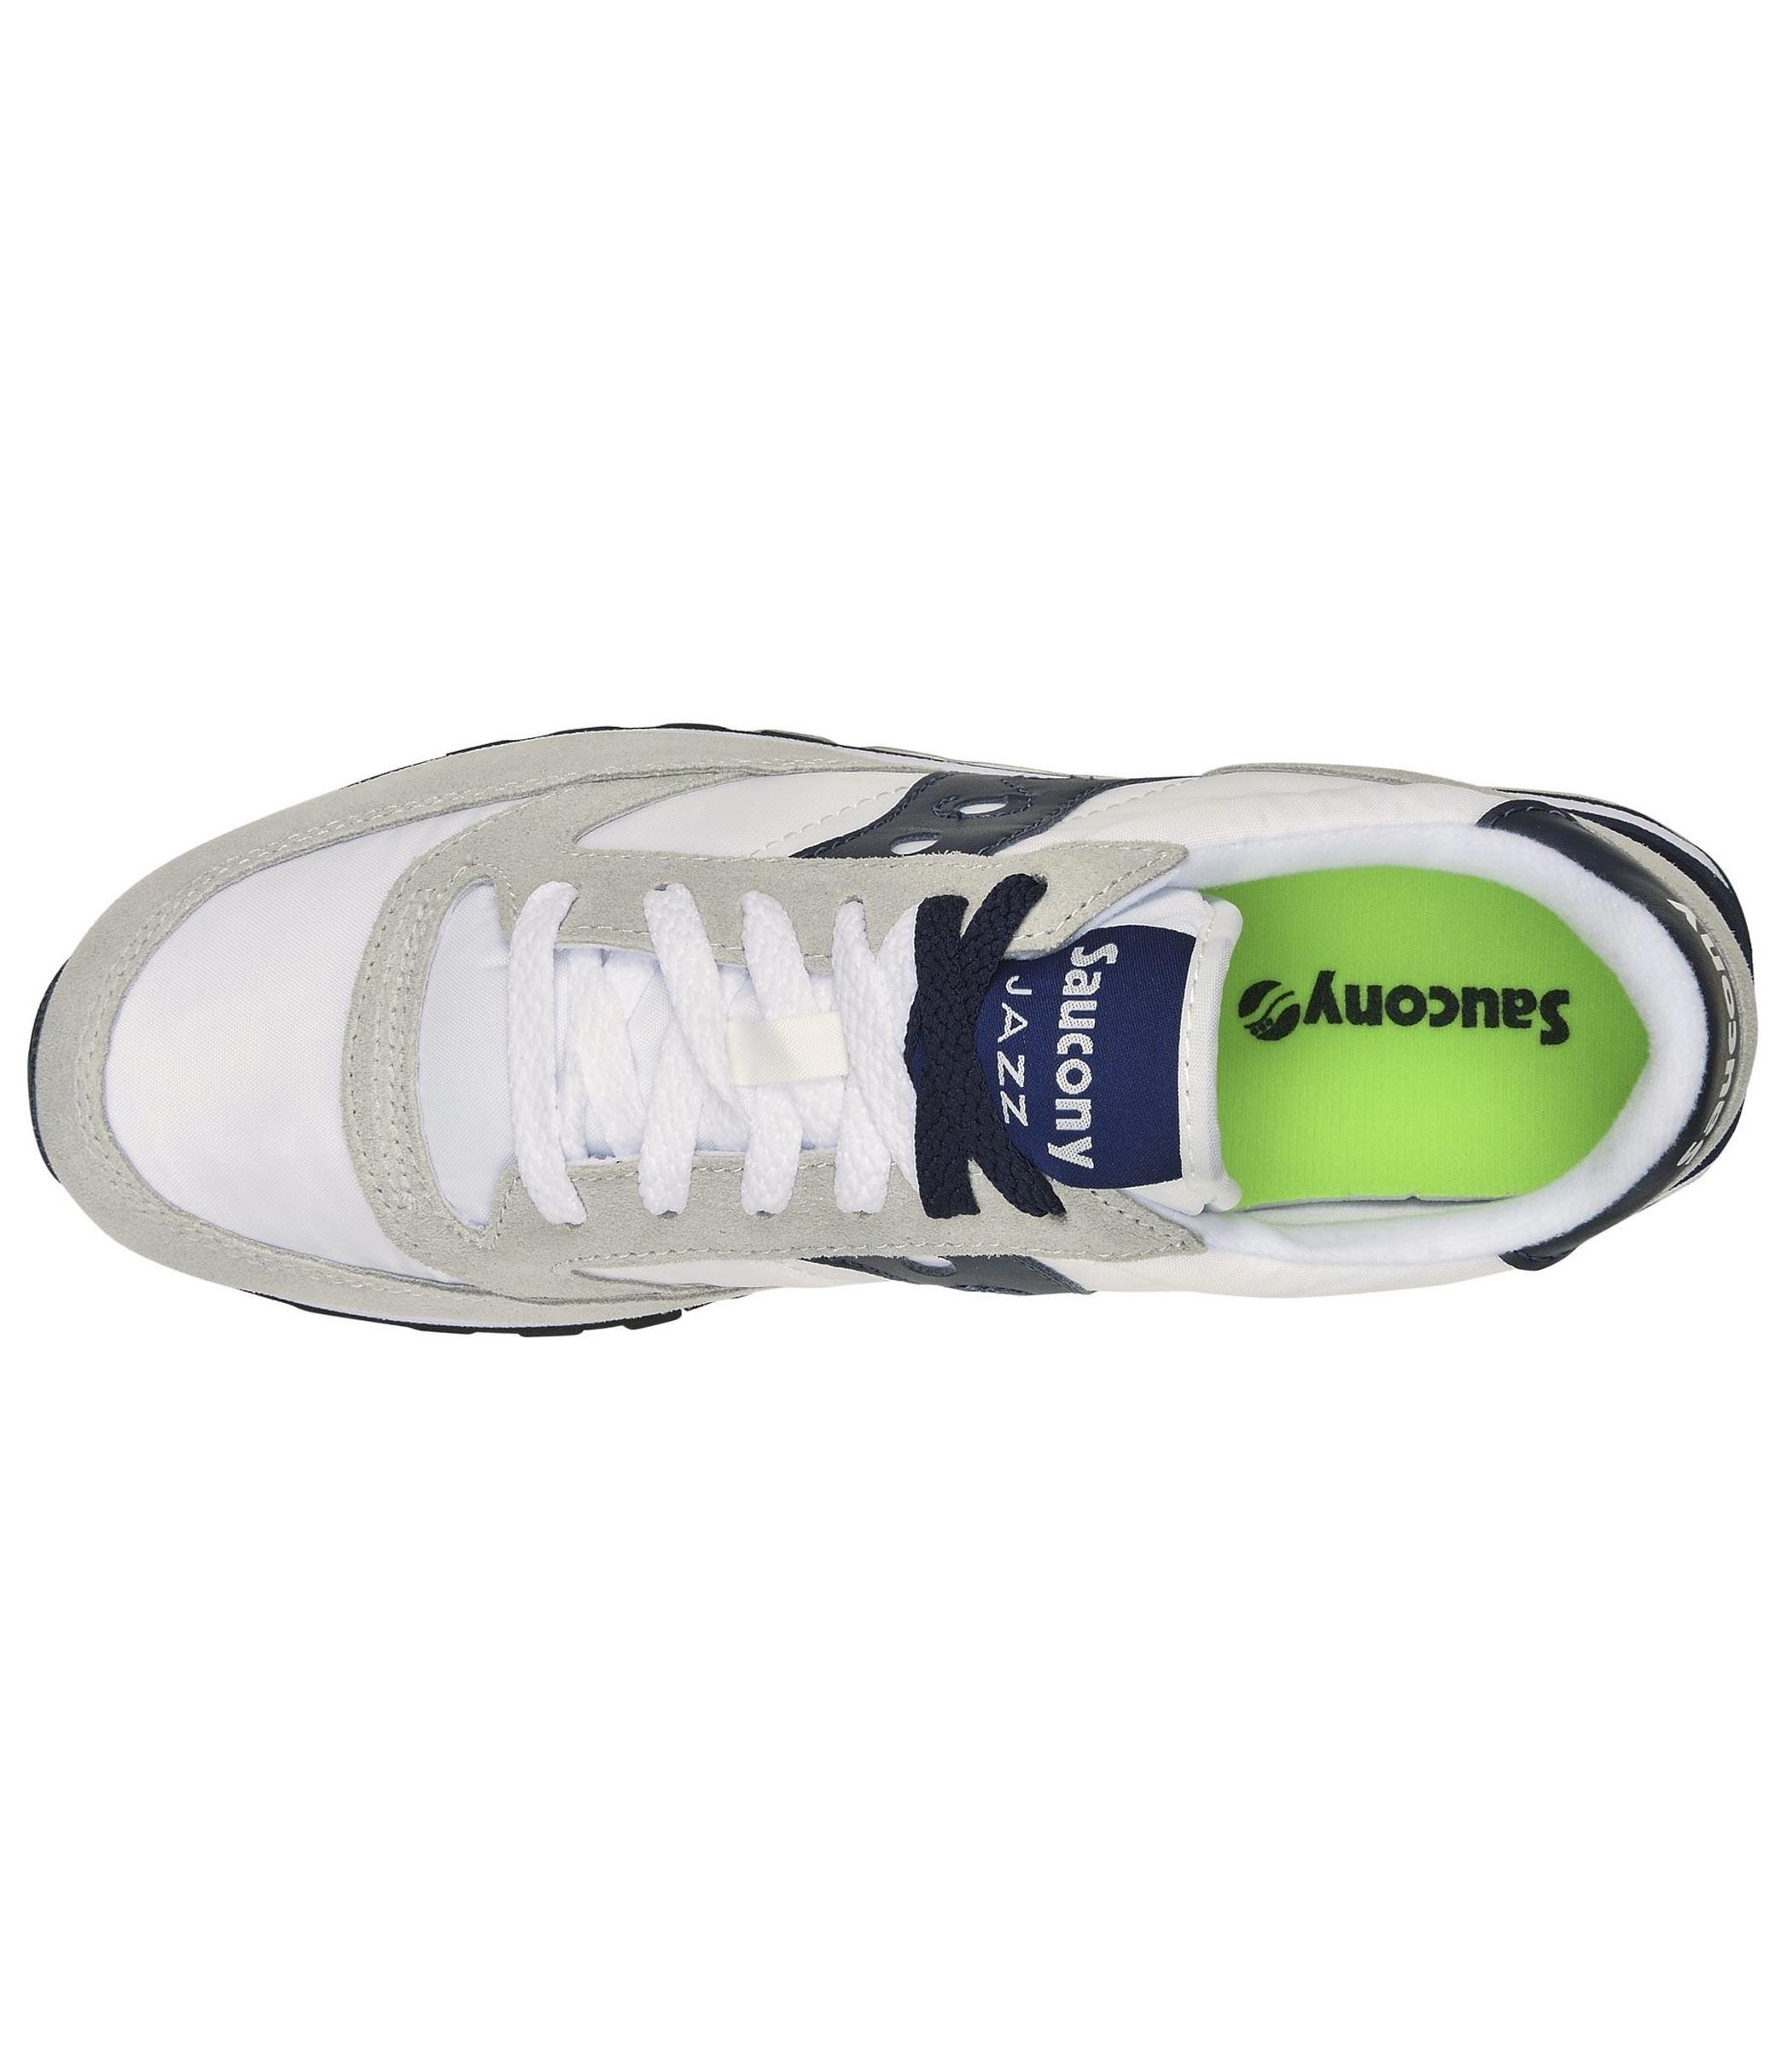 Scarpe Sneakers Saucony Jazz Original da uomo rif. S2044-331 2aaef454586